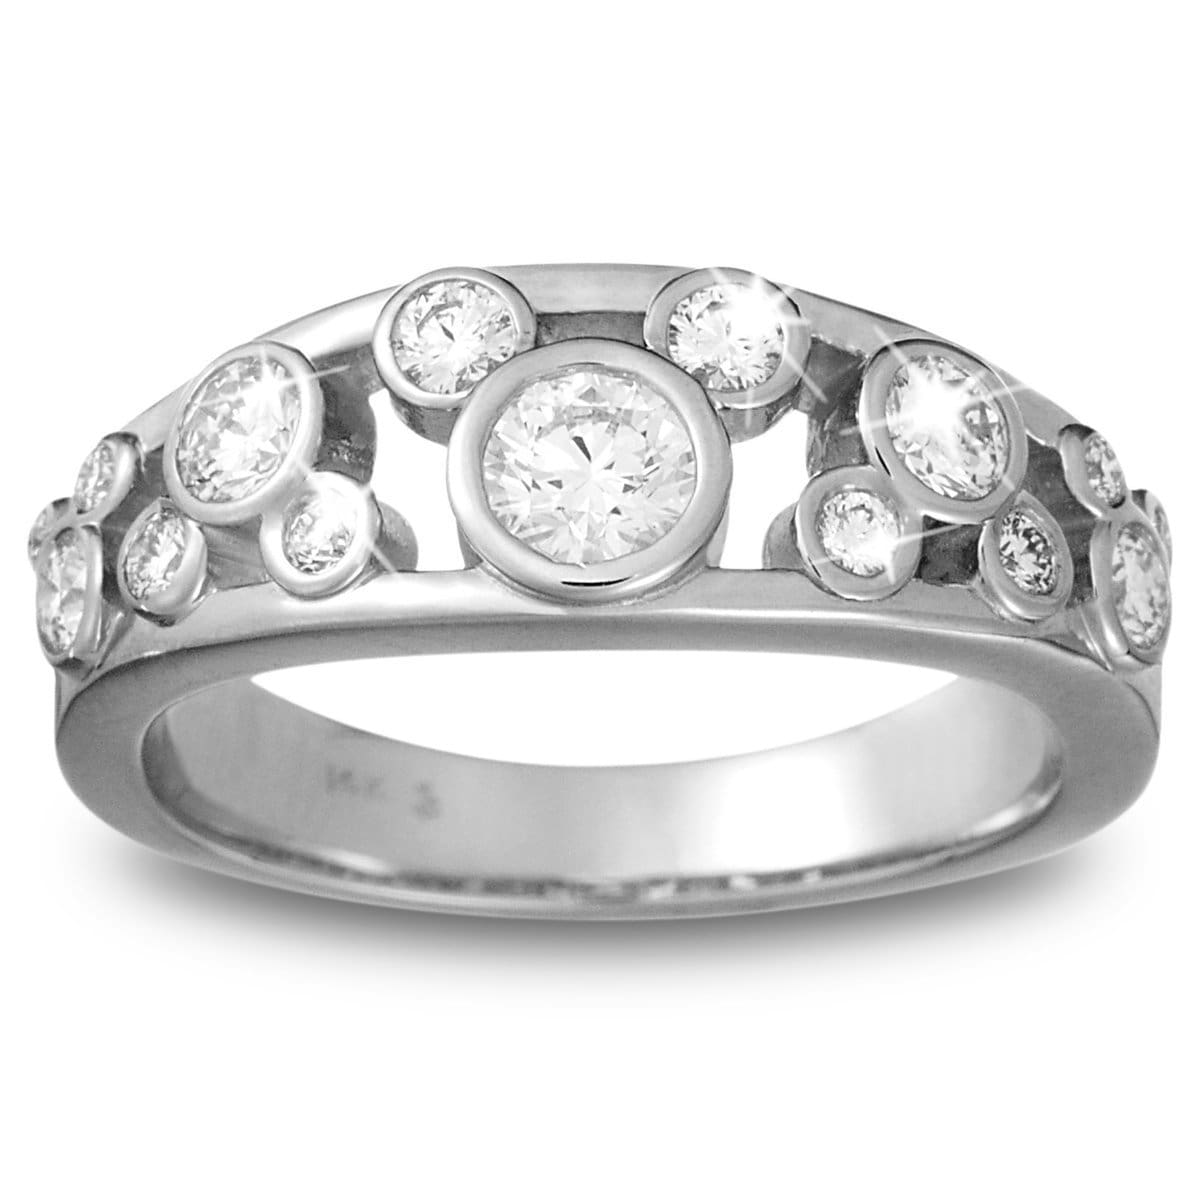 Mickey Mouse Diamond Ring for Women - Platinum | shopDisney